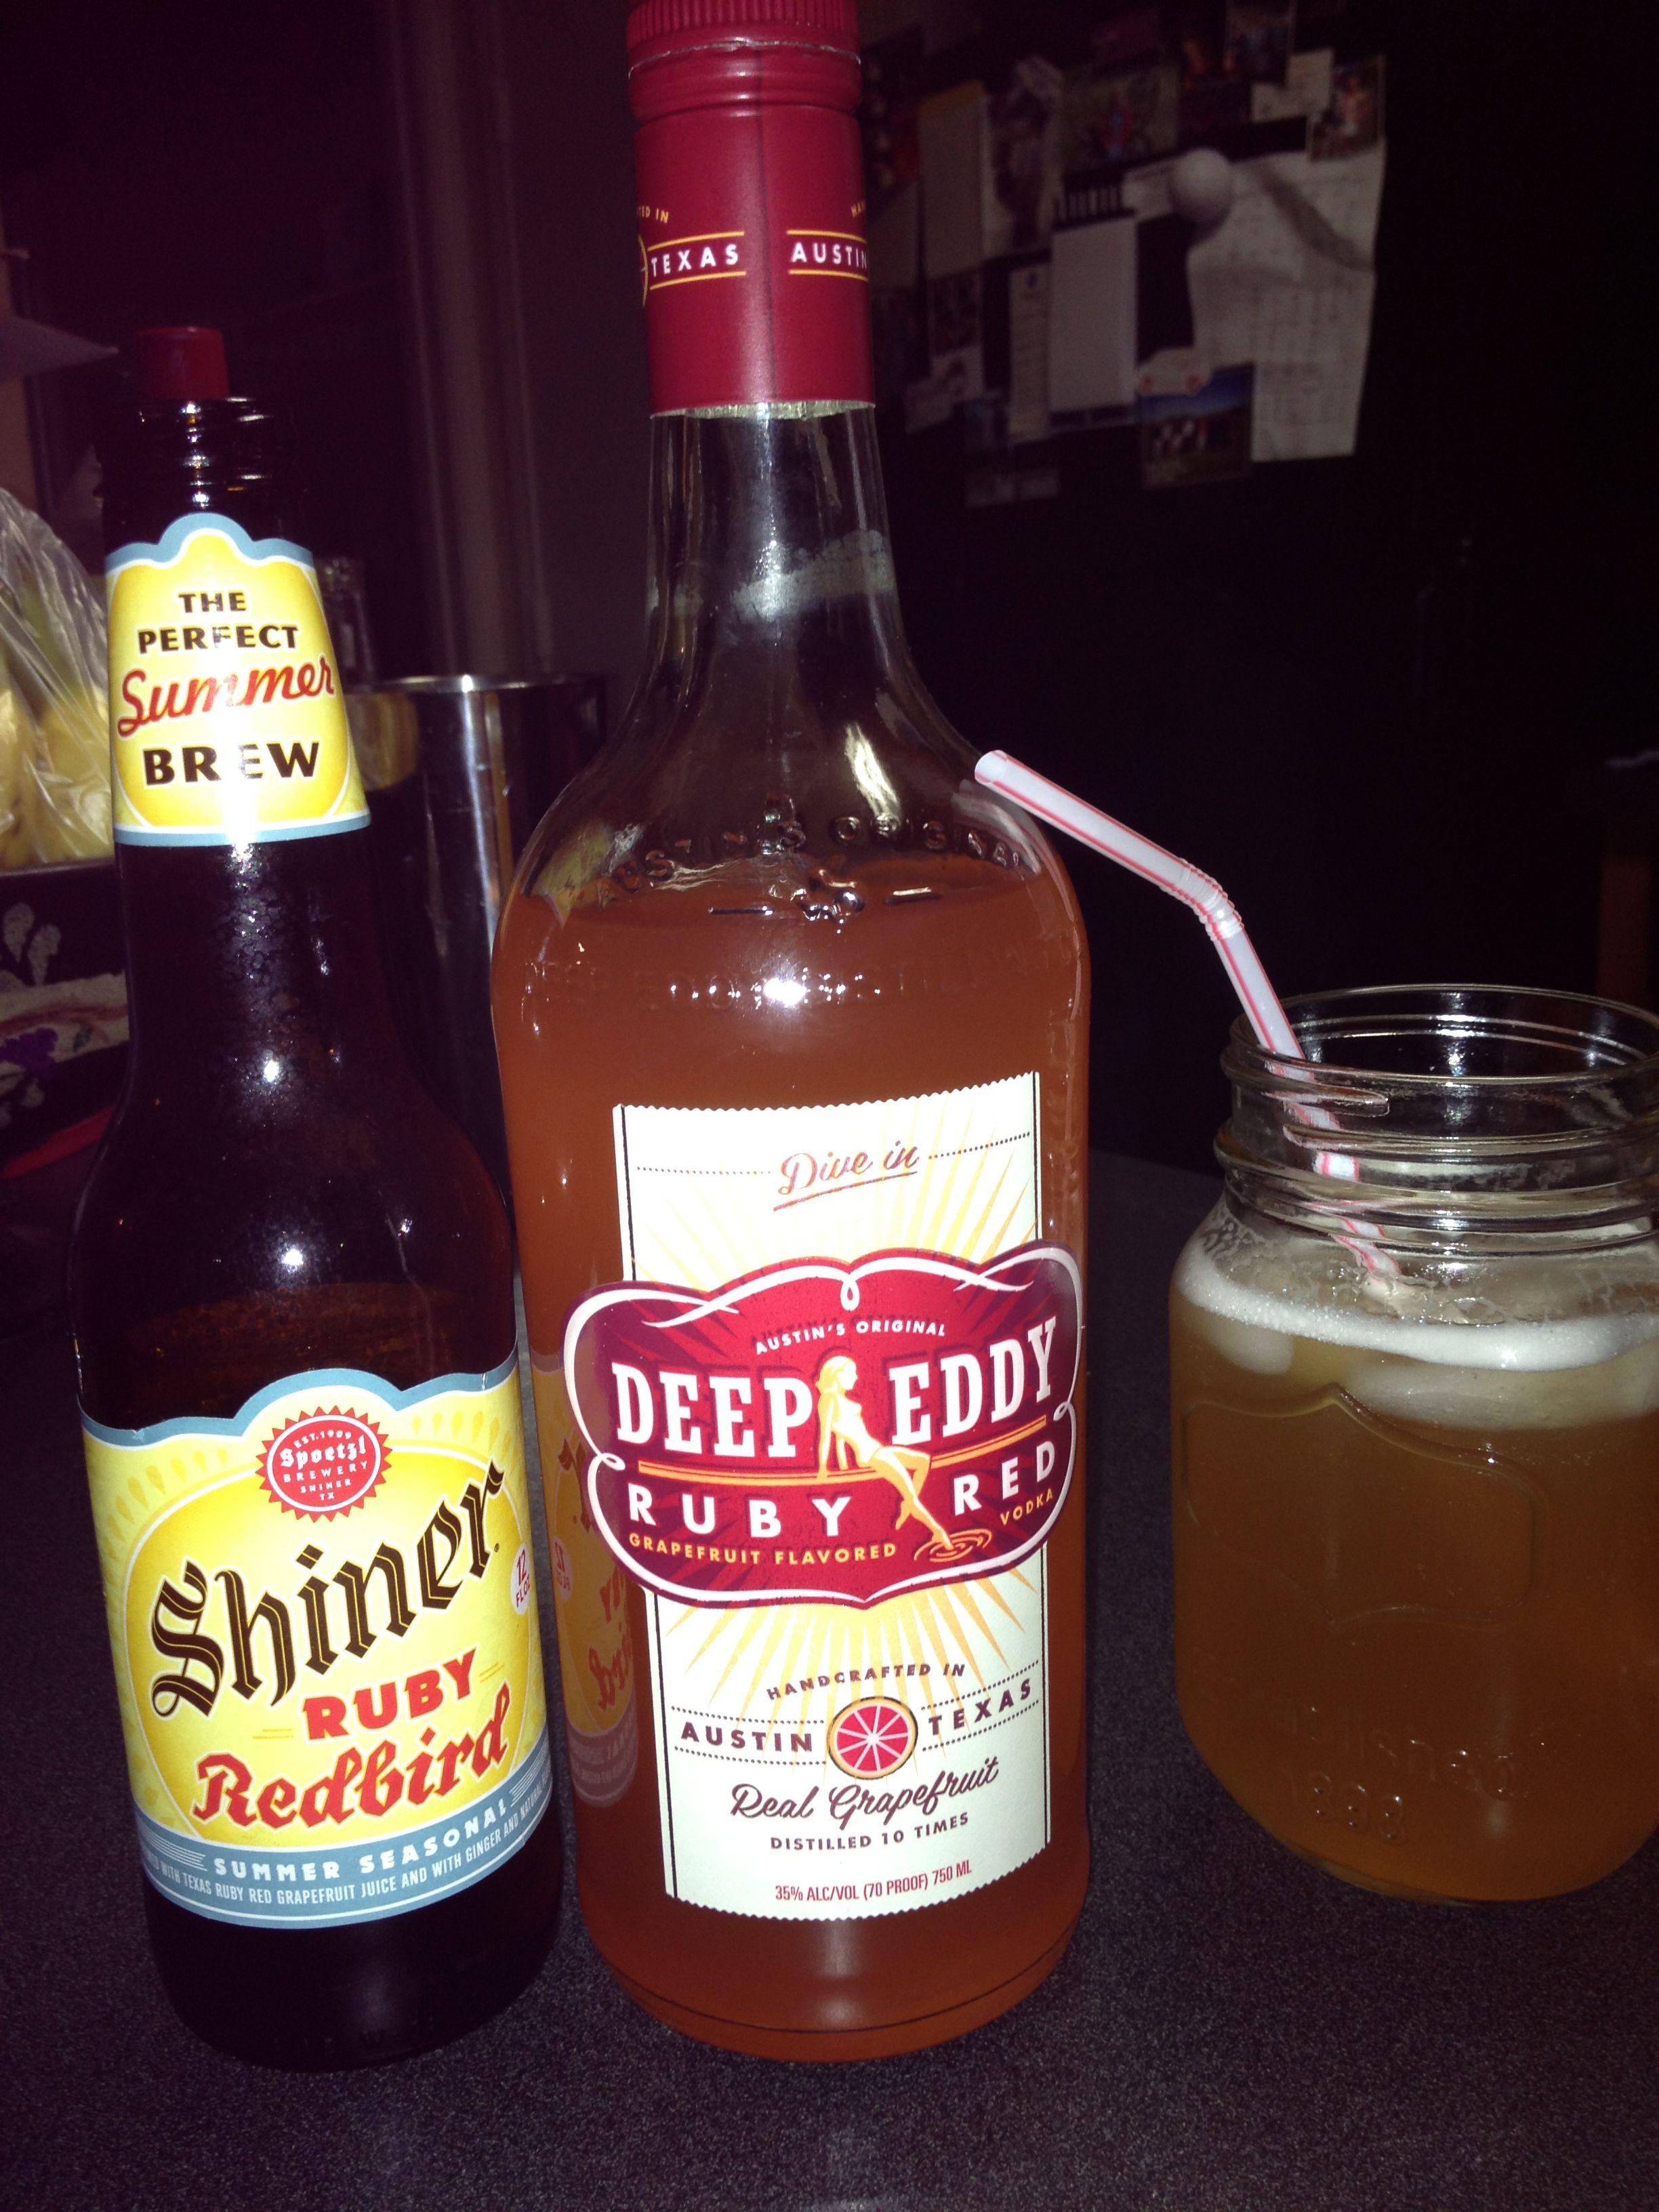 Part Deep Eddy Grapefruit Vodka Part Shiner Ruby Redbird Beer